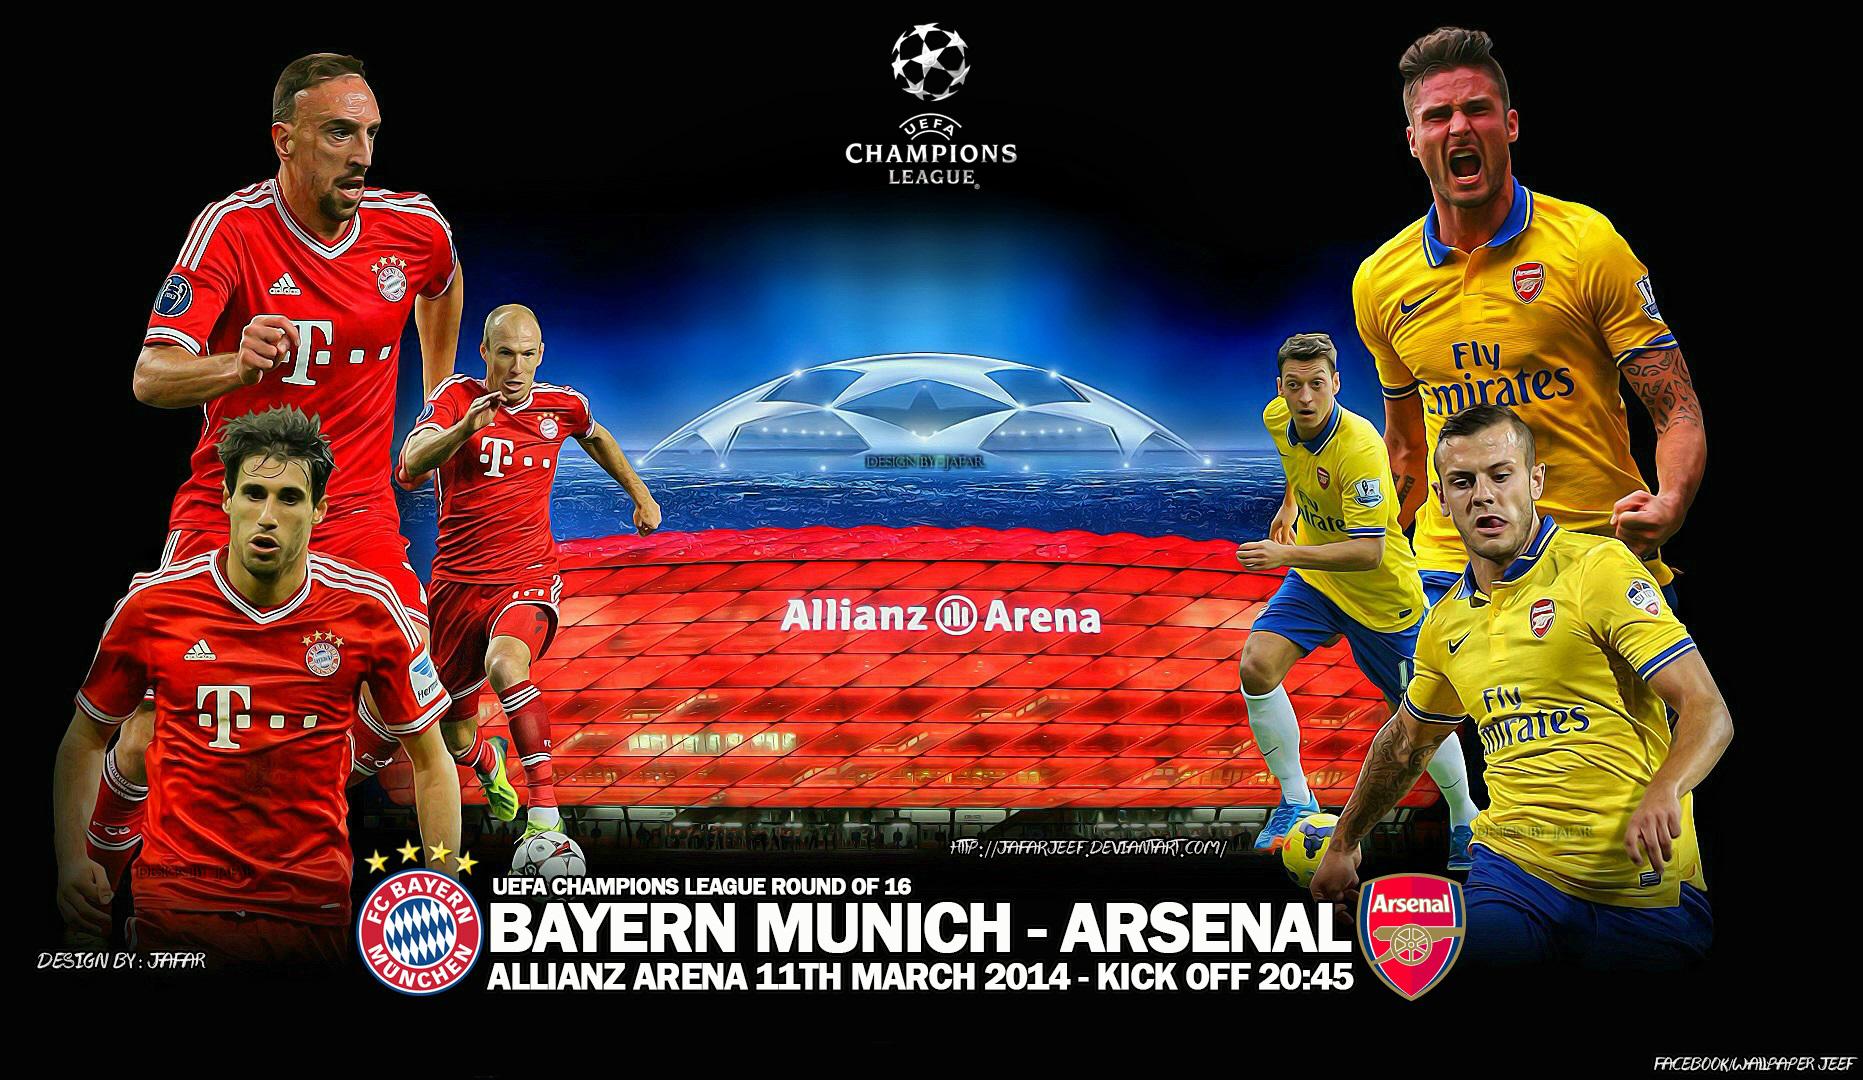 Bayern Munich Arsenal Wallpaper 2014 1jpg 1863x1080